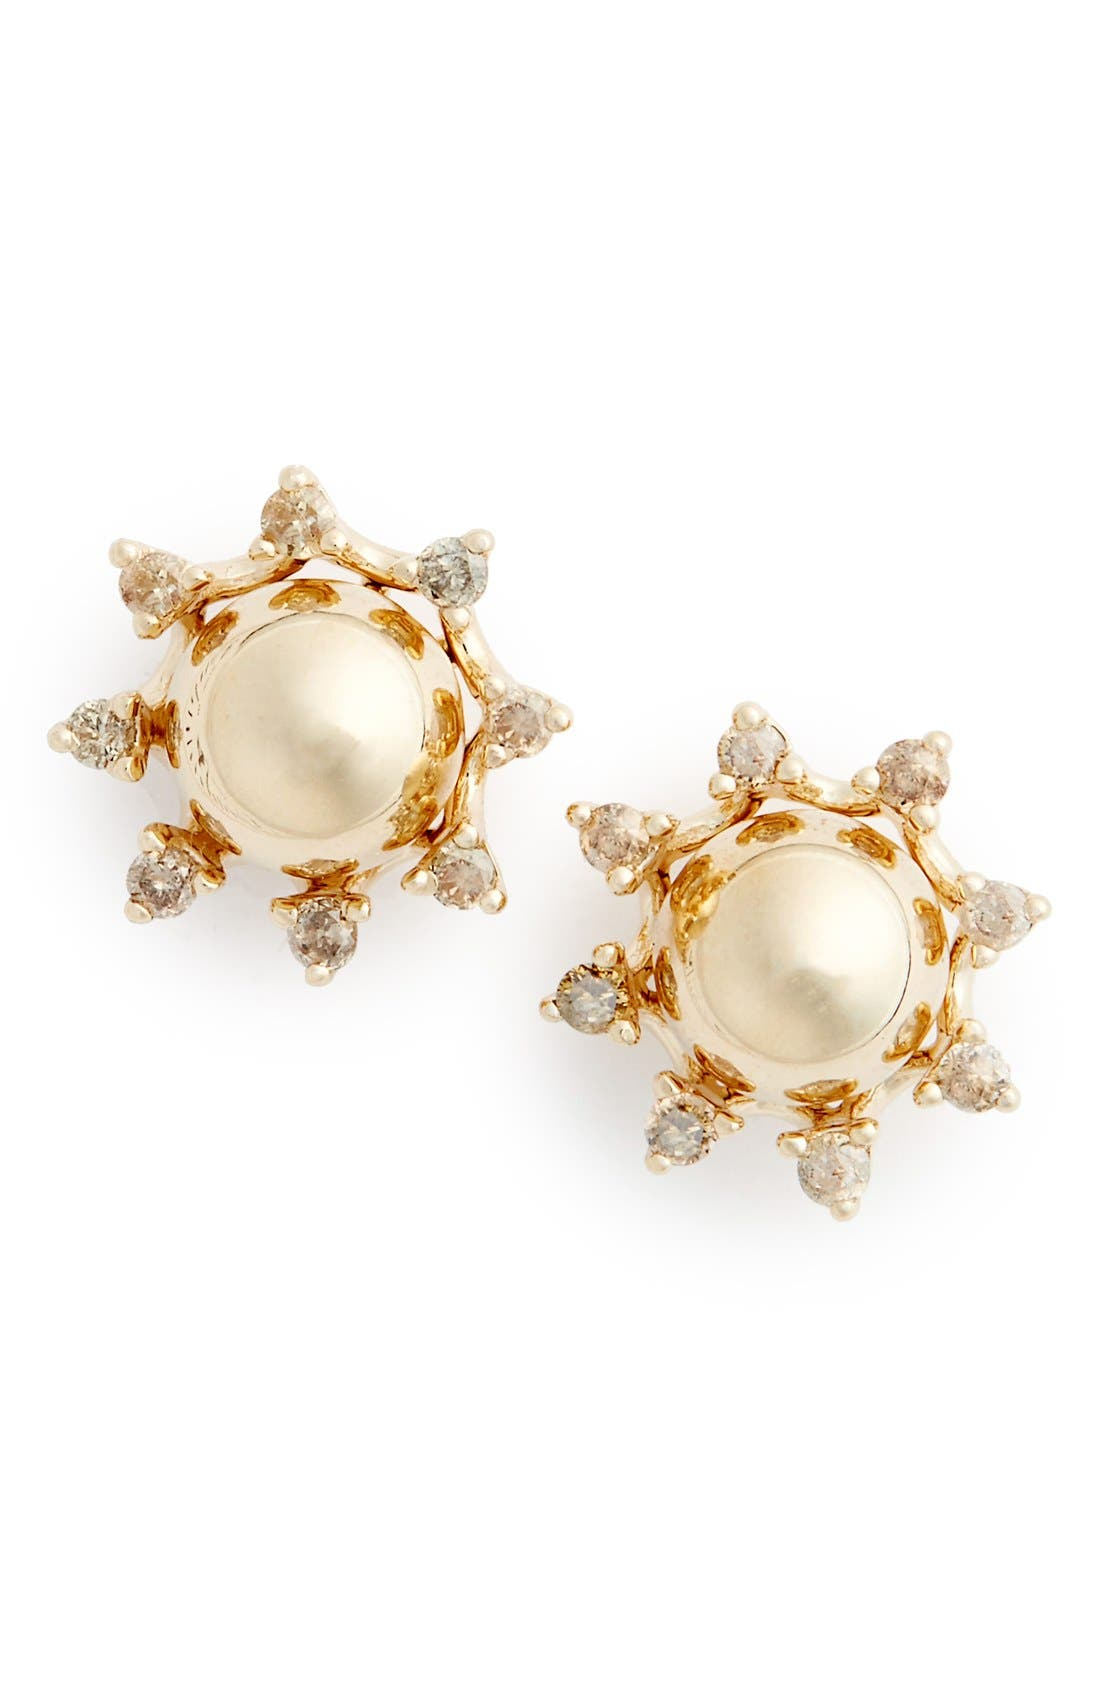 Anna Sheffield 'Starlight' Champagne Diamond Stud Earrings